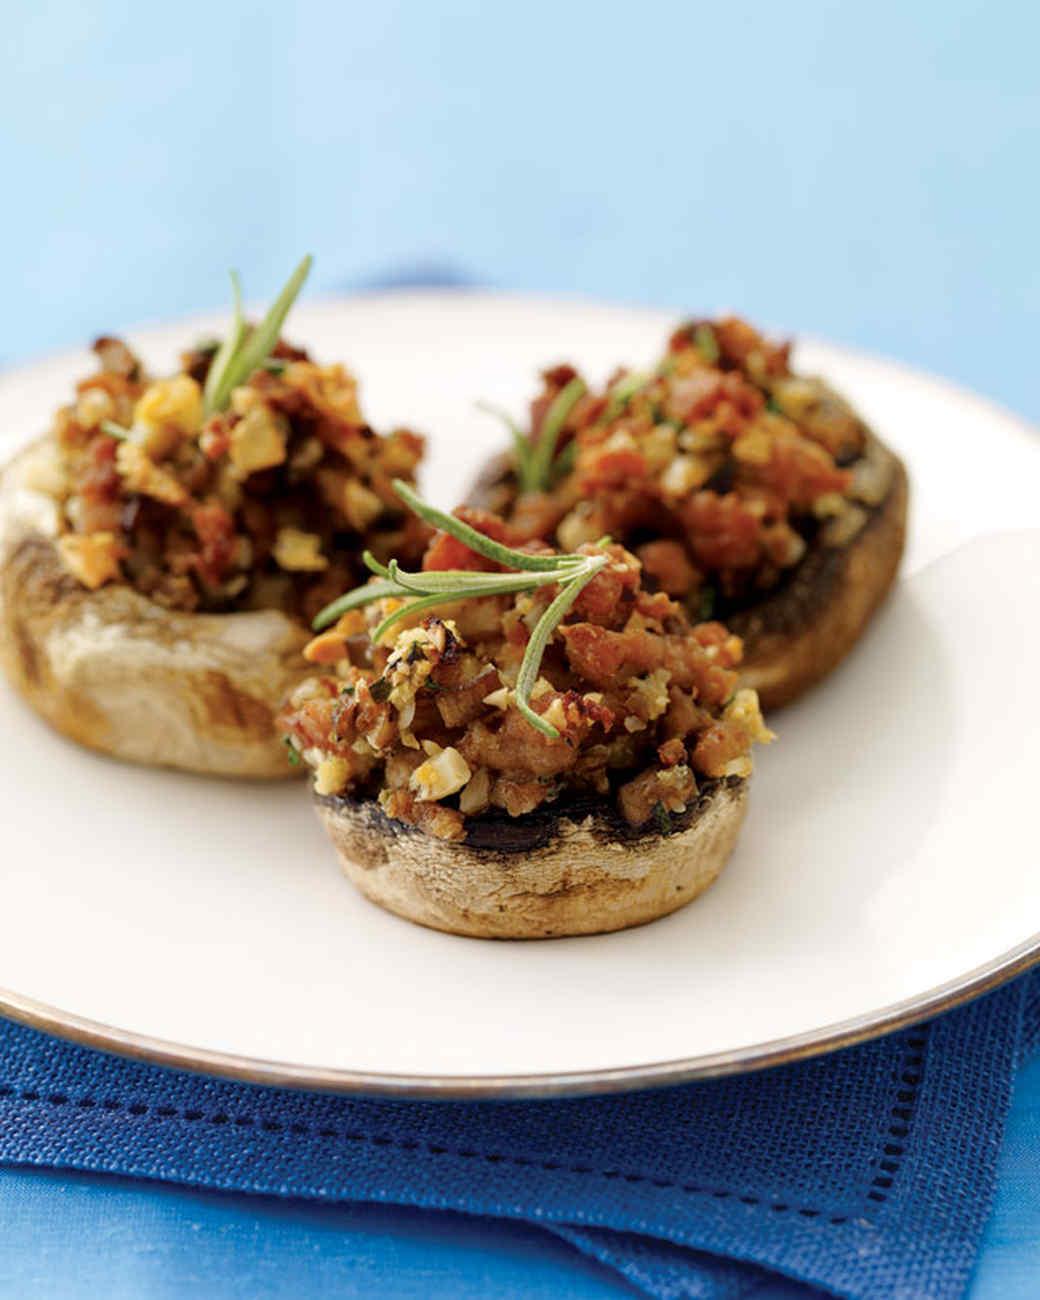 Hazelnut and Turkey-Sausage Stuffed Mushrooms